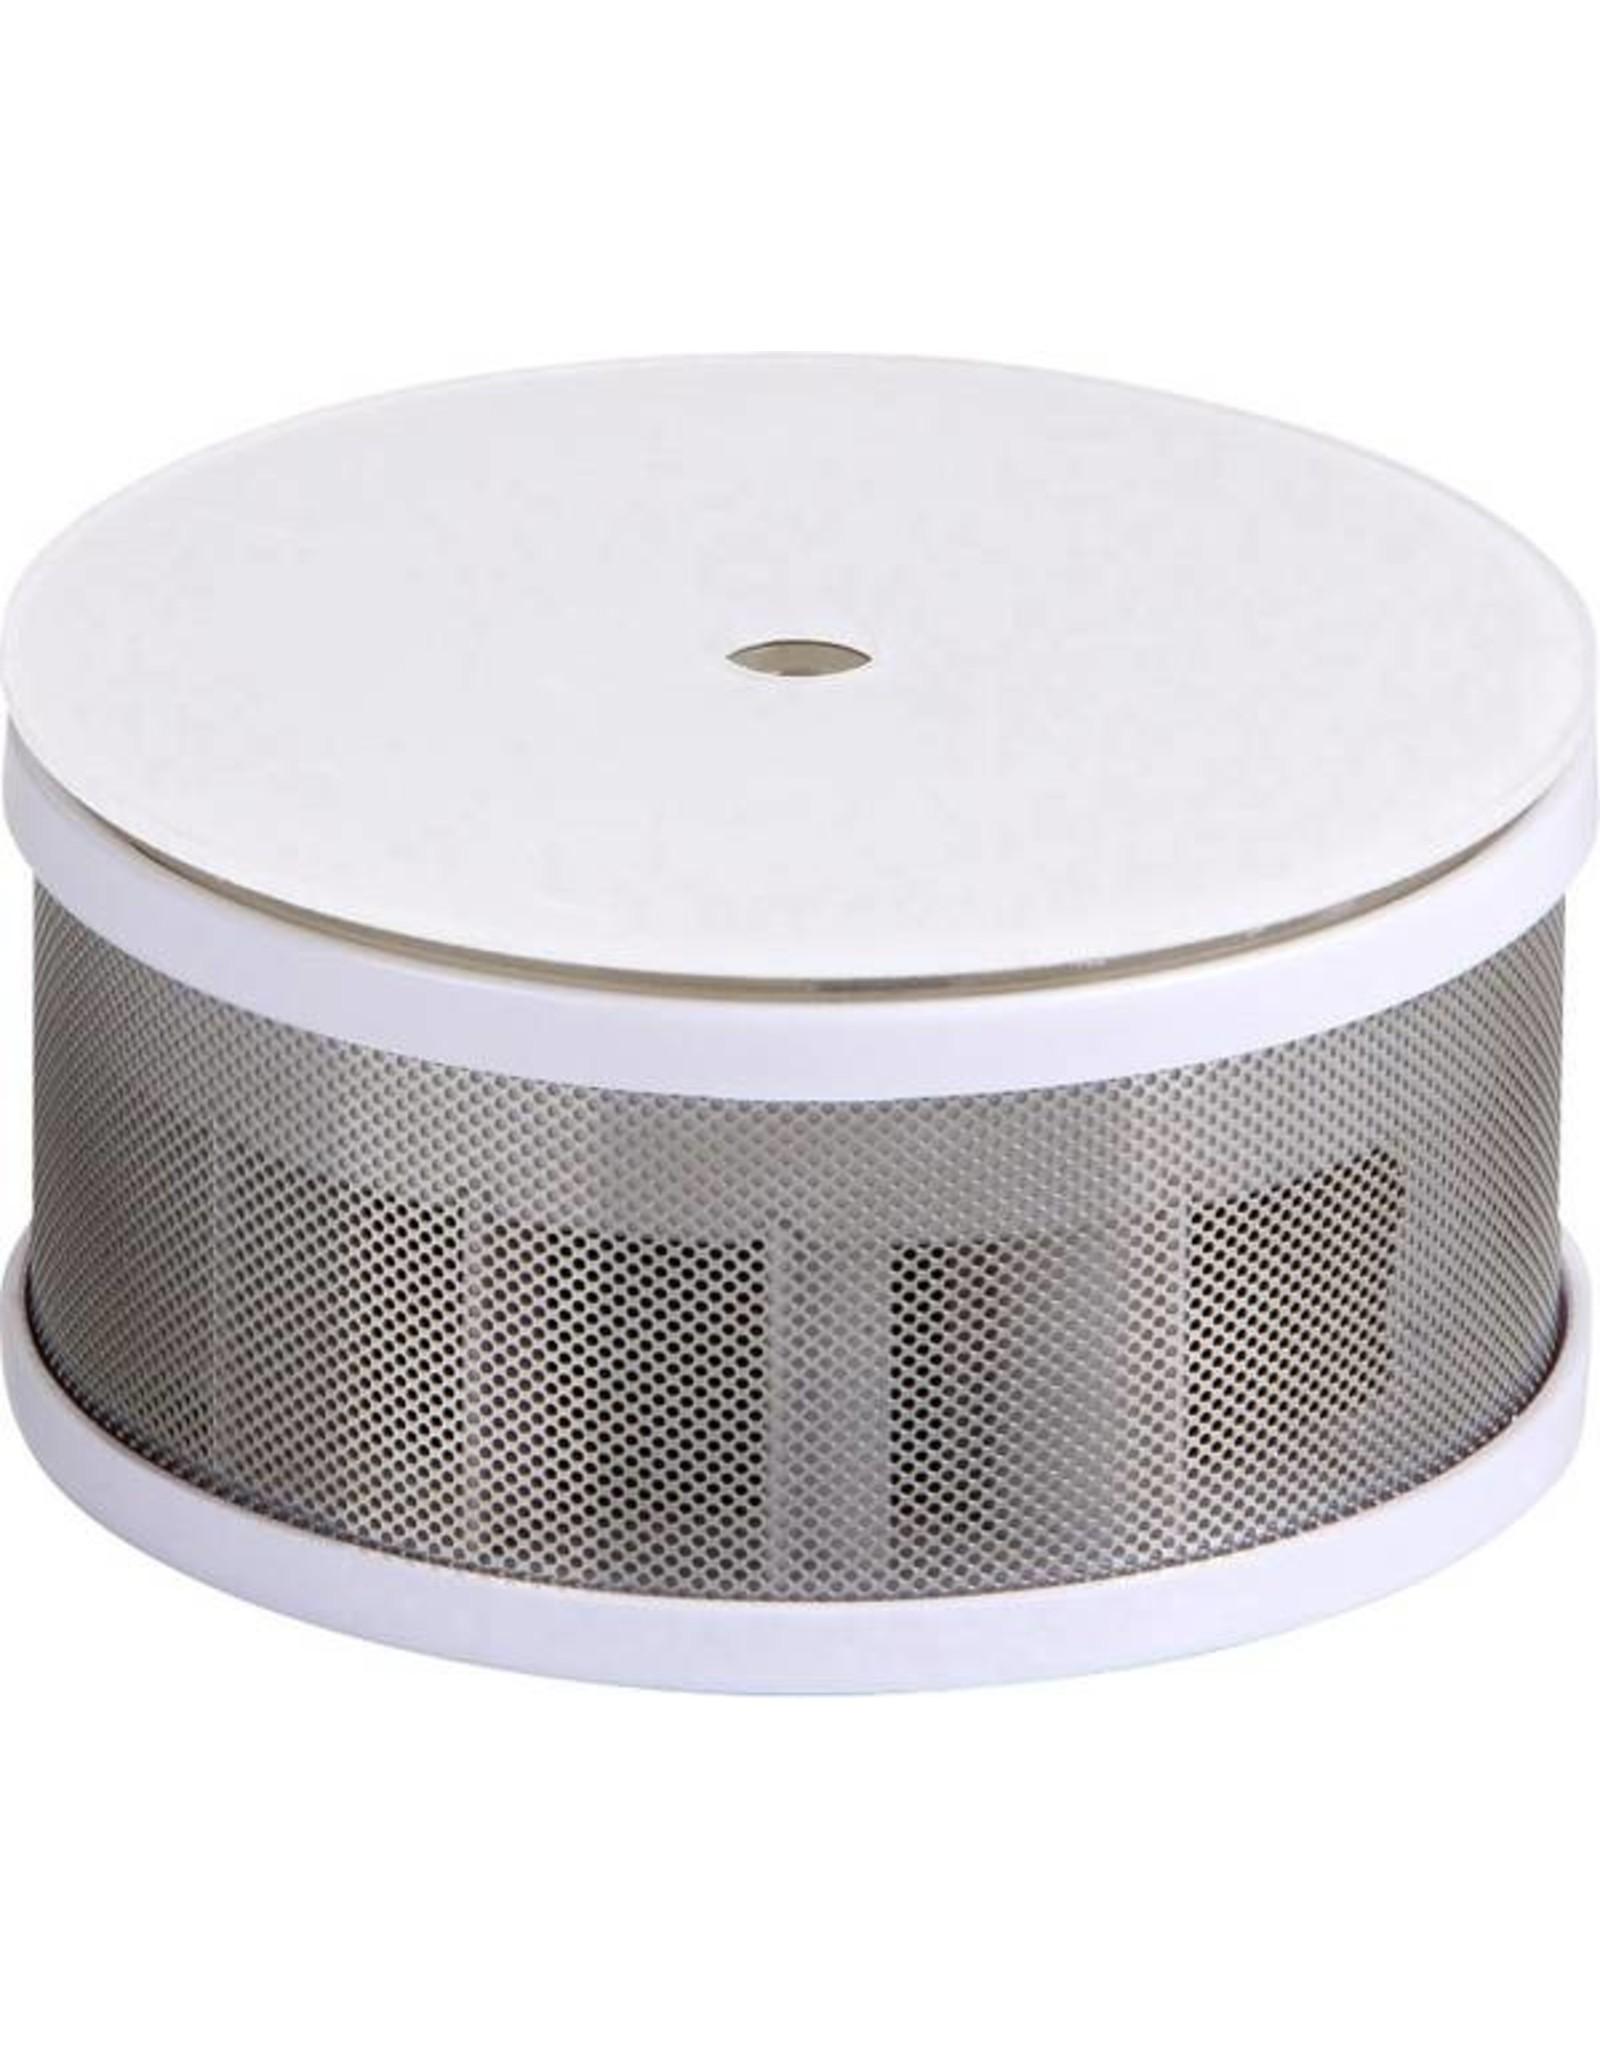 Elro Elro Pro Sensus 7M Smoke Alarm